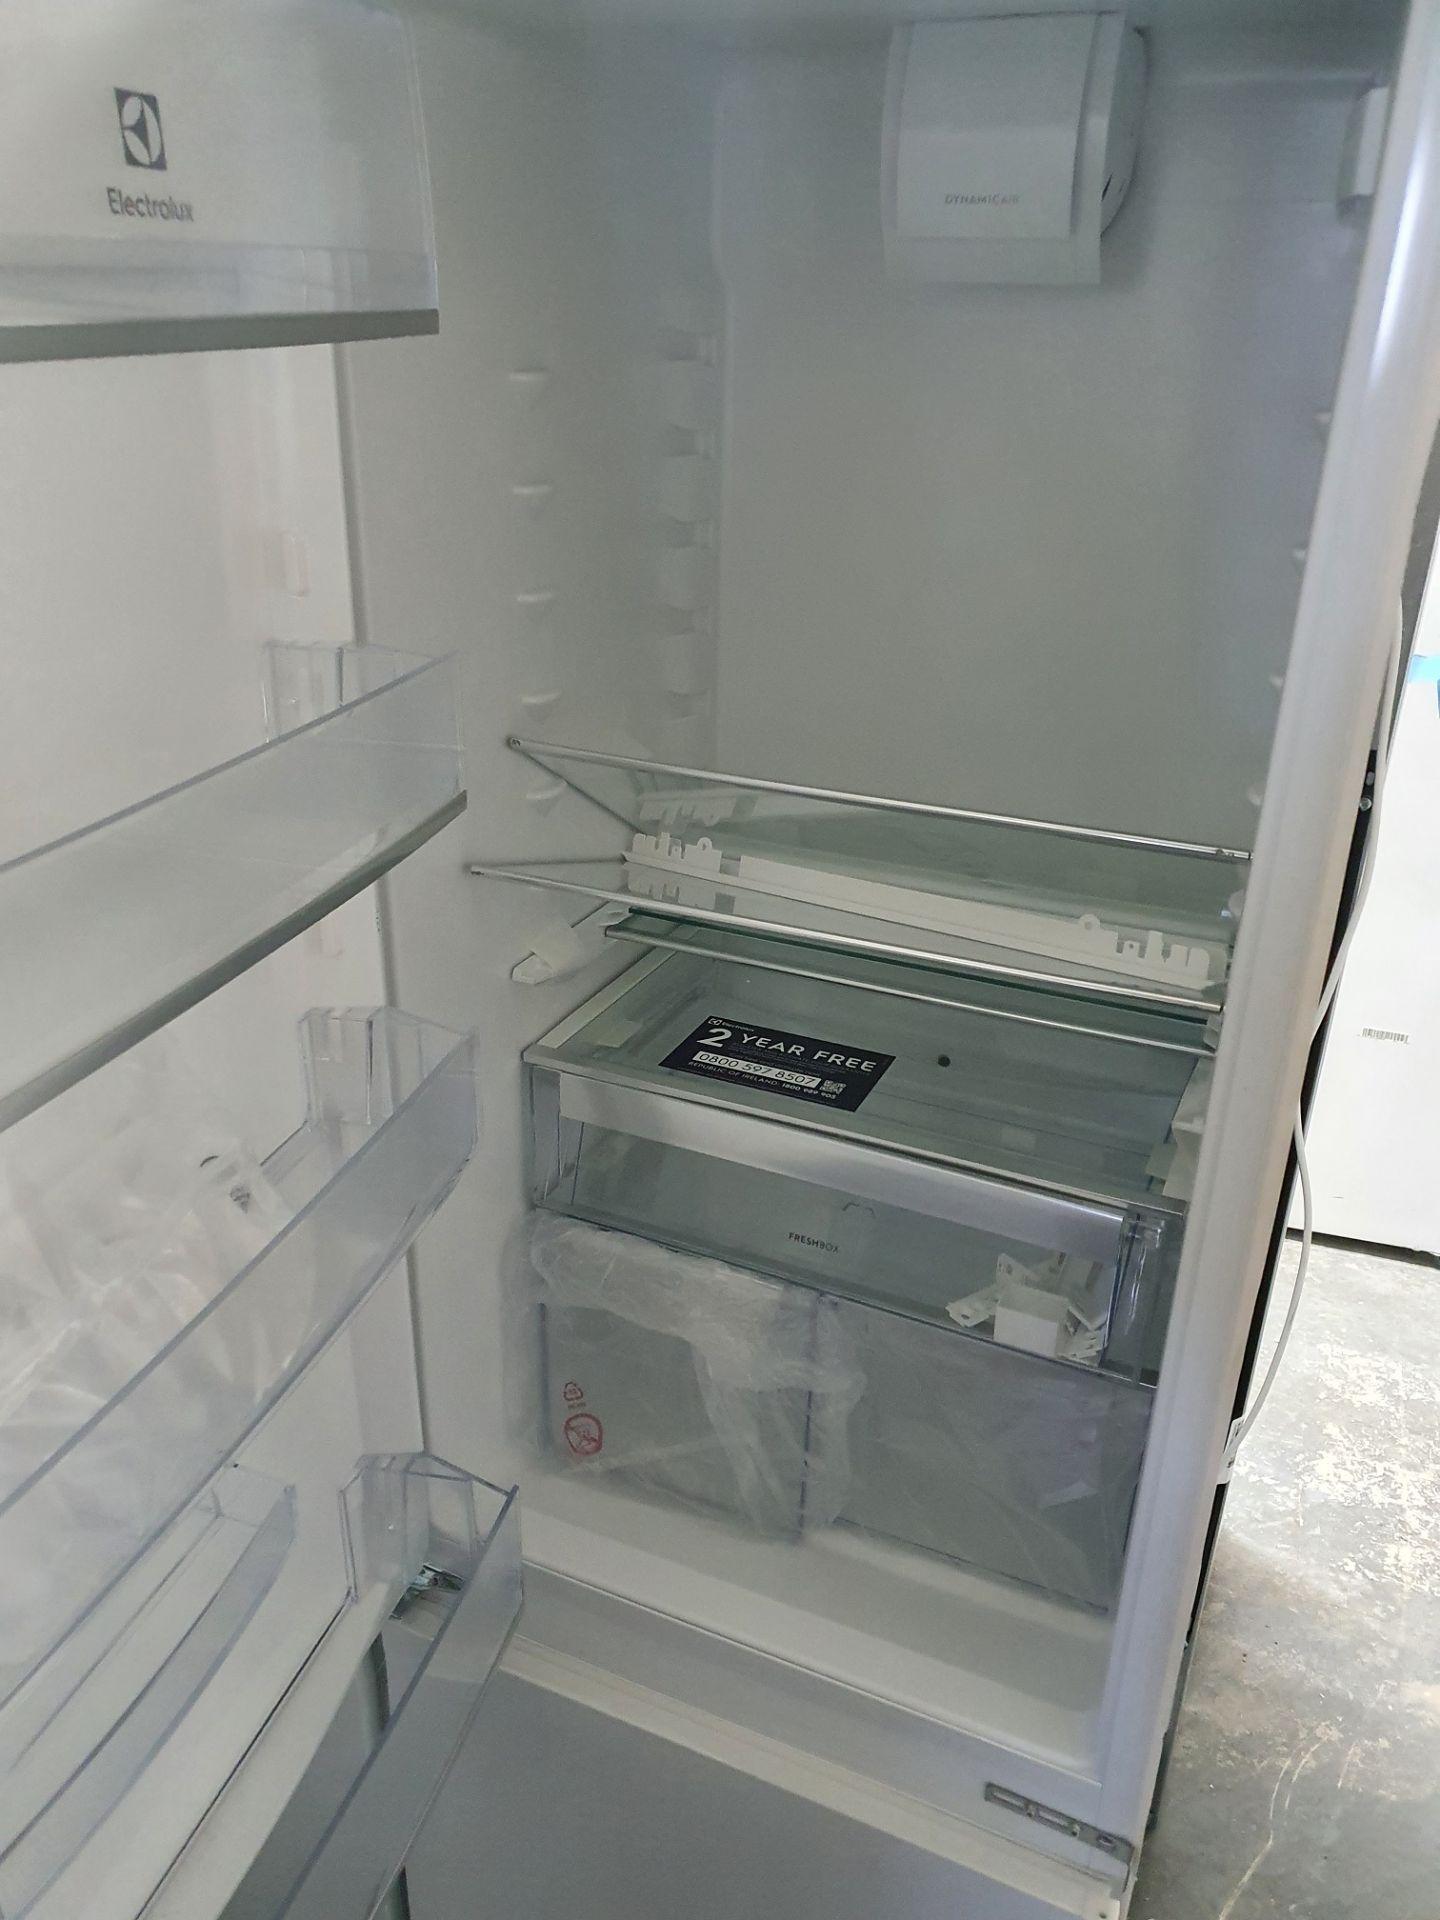 NEW/GRADED AND UNPACKAGED Zanussi ZBB28441SV Integrated 70/30 Fridge Freezer (Brand new slight - Image 11 of 14